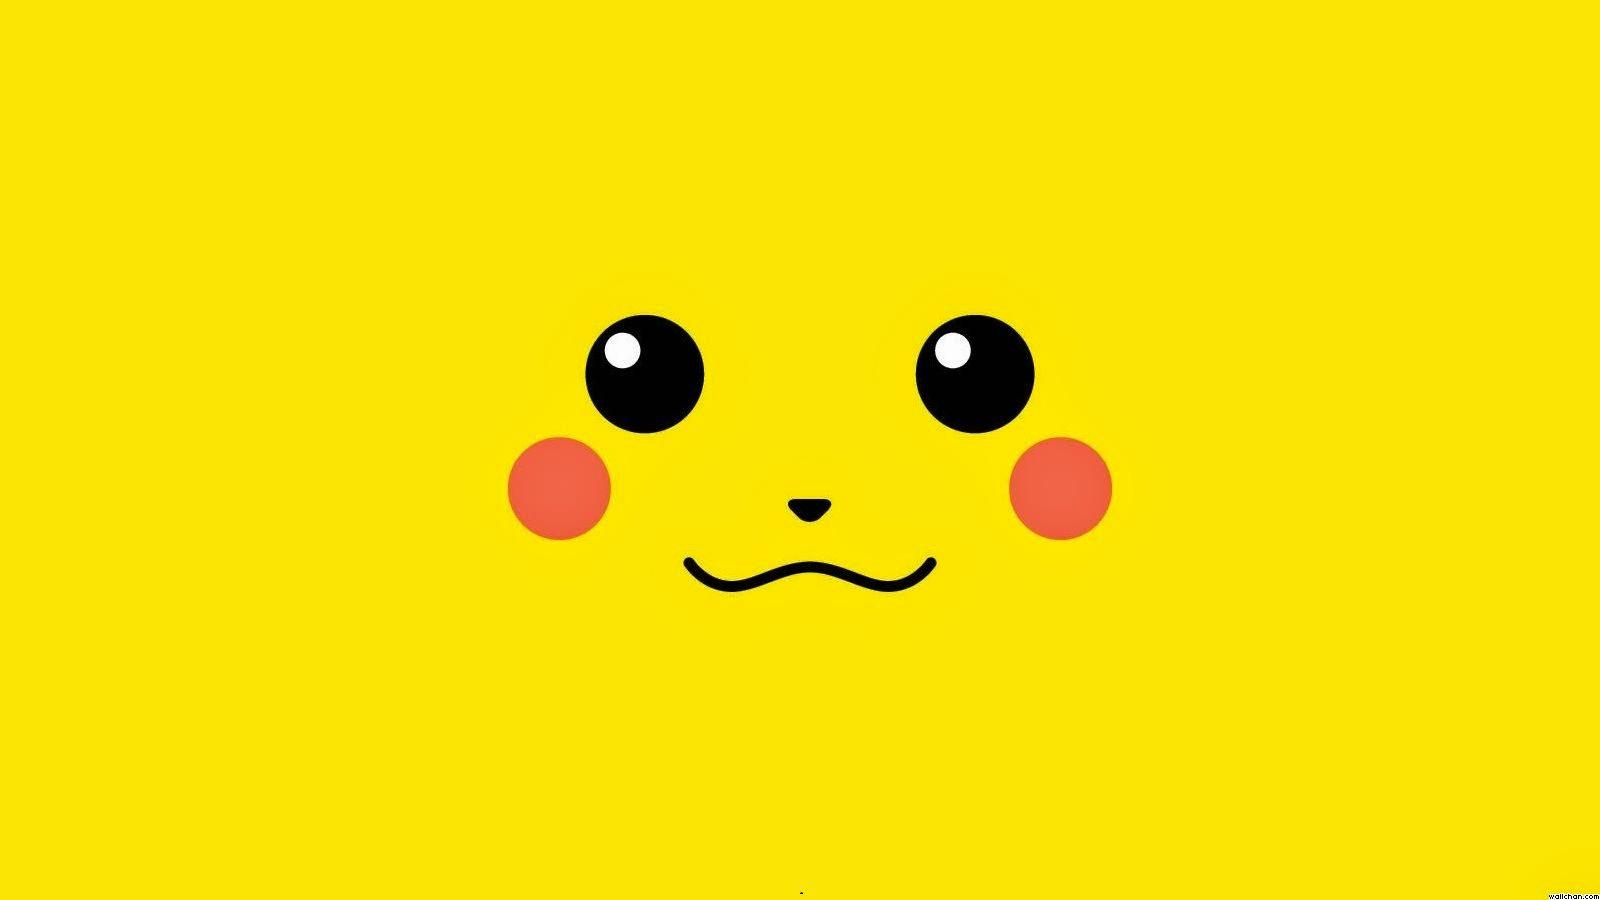 face wallpaper pikachu face wallpaper pikachu face wallpaper pikachu    Pikachu Face Wallpaper